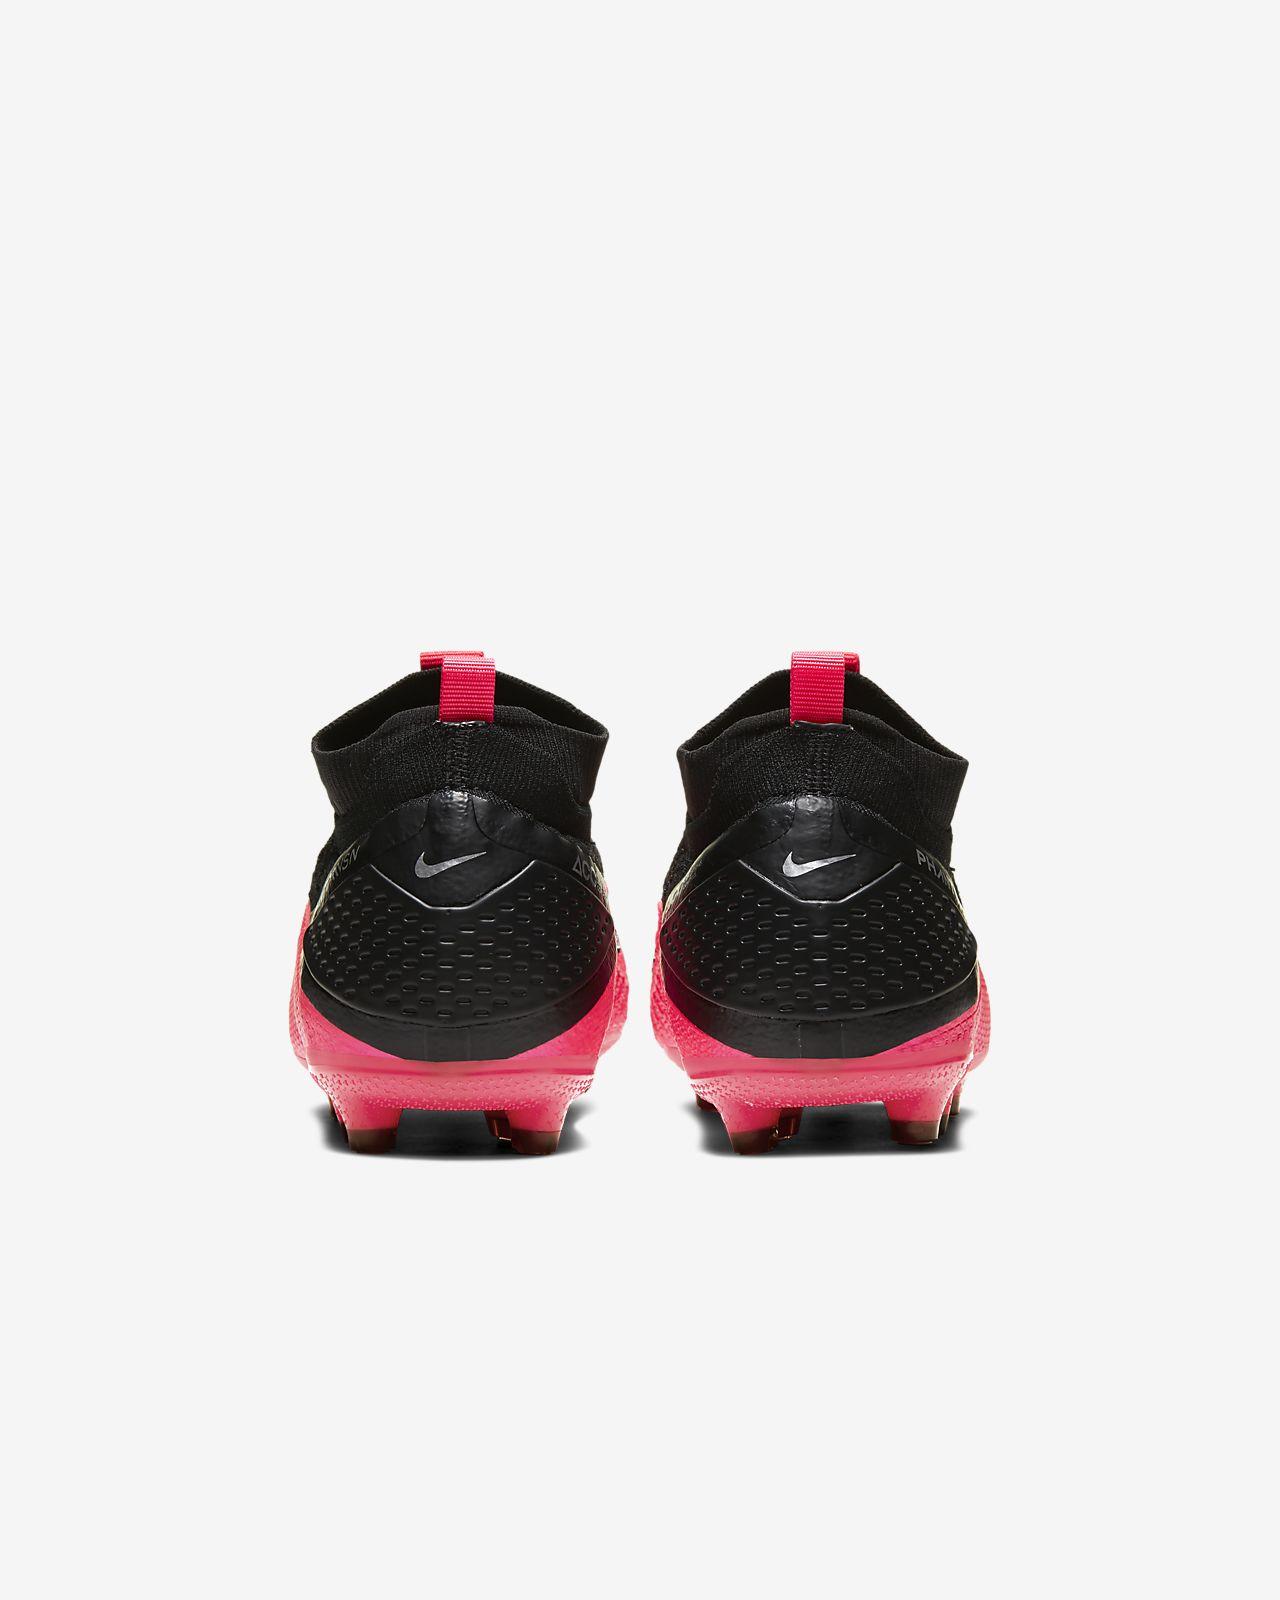 Nike Jr. Kids' Phantom Vision Elite Dynamic Fit MG Multi Ground Football Boot